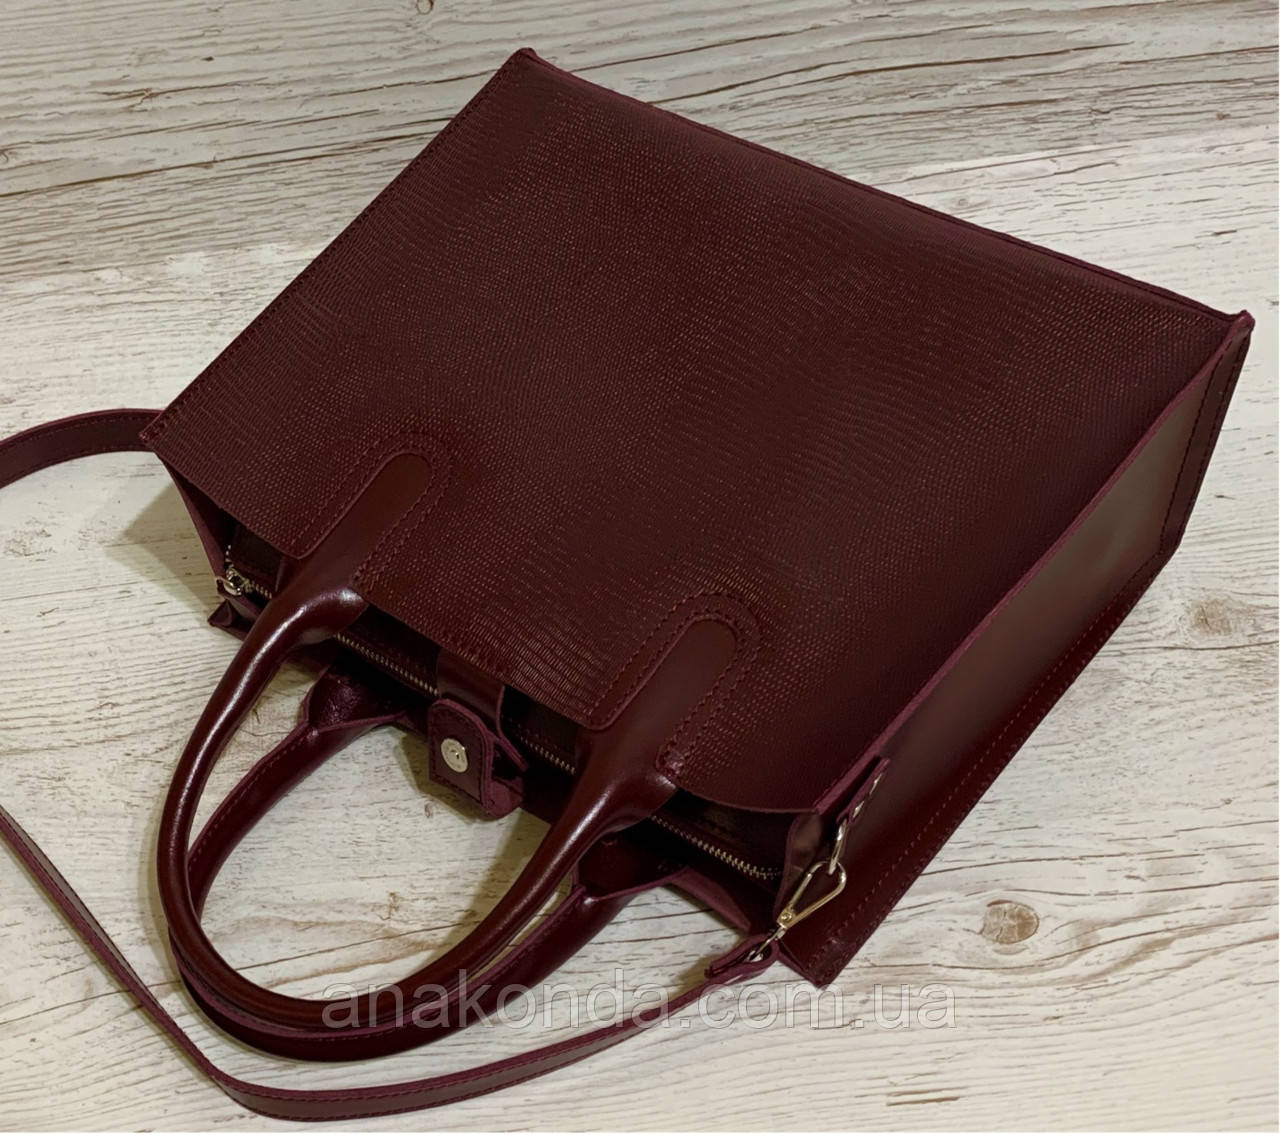 77-2 Натуральная кожа Женская сумка бордовая формат А4 Женская сумка кожаная марсала натуральная вишневая